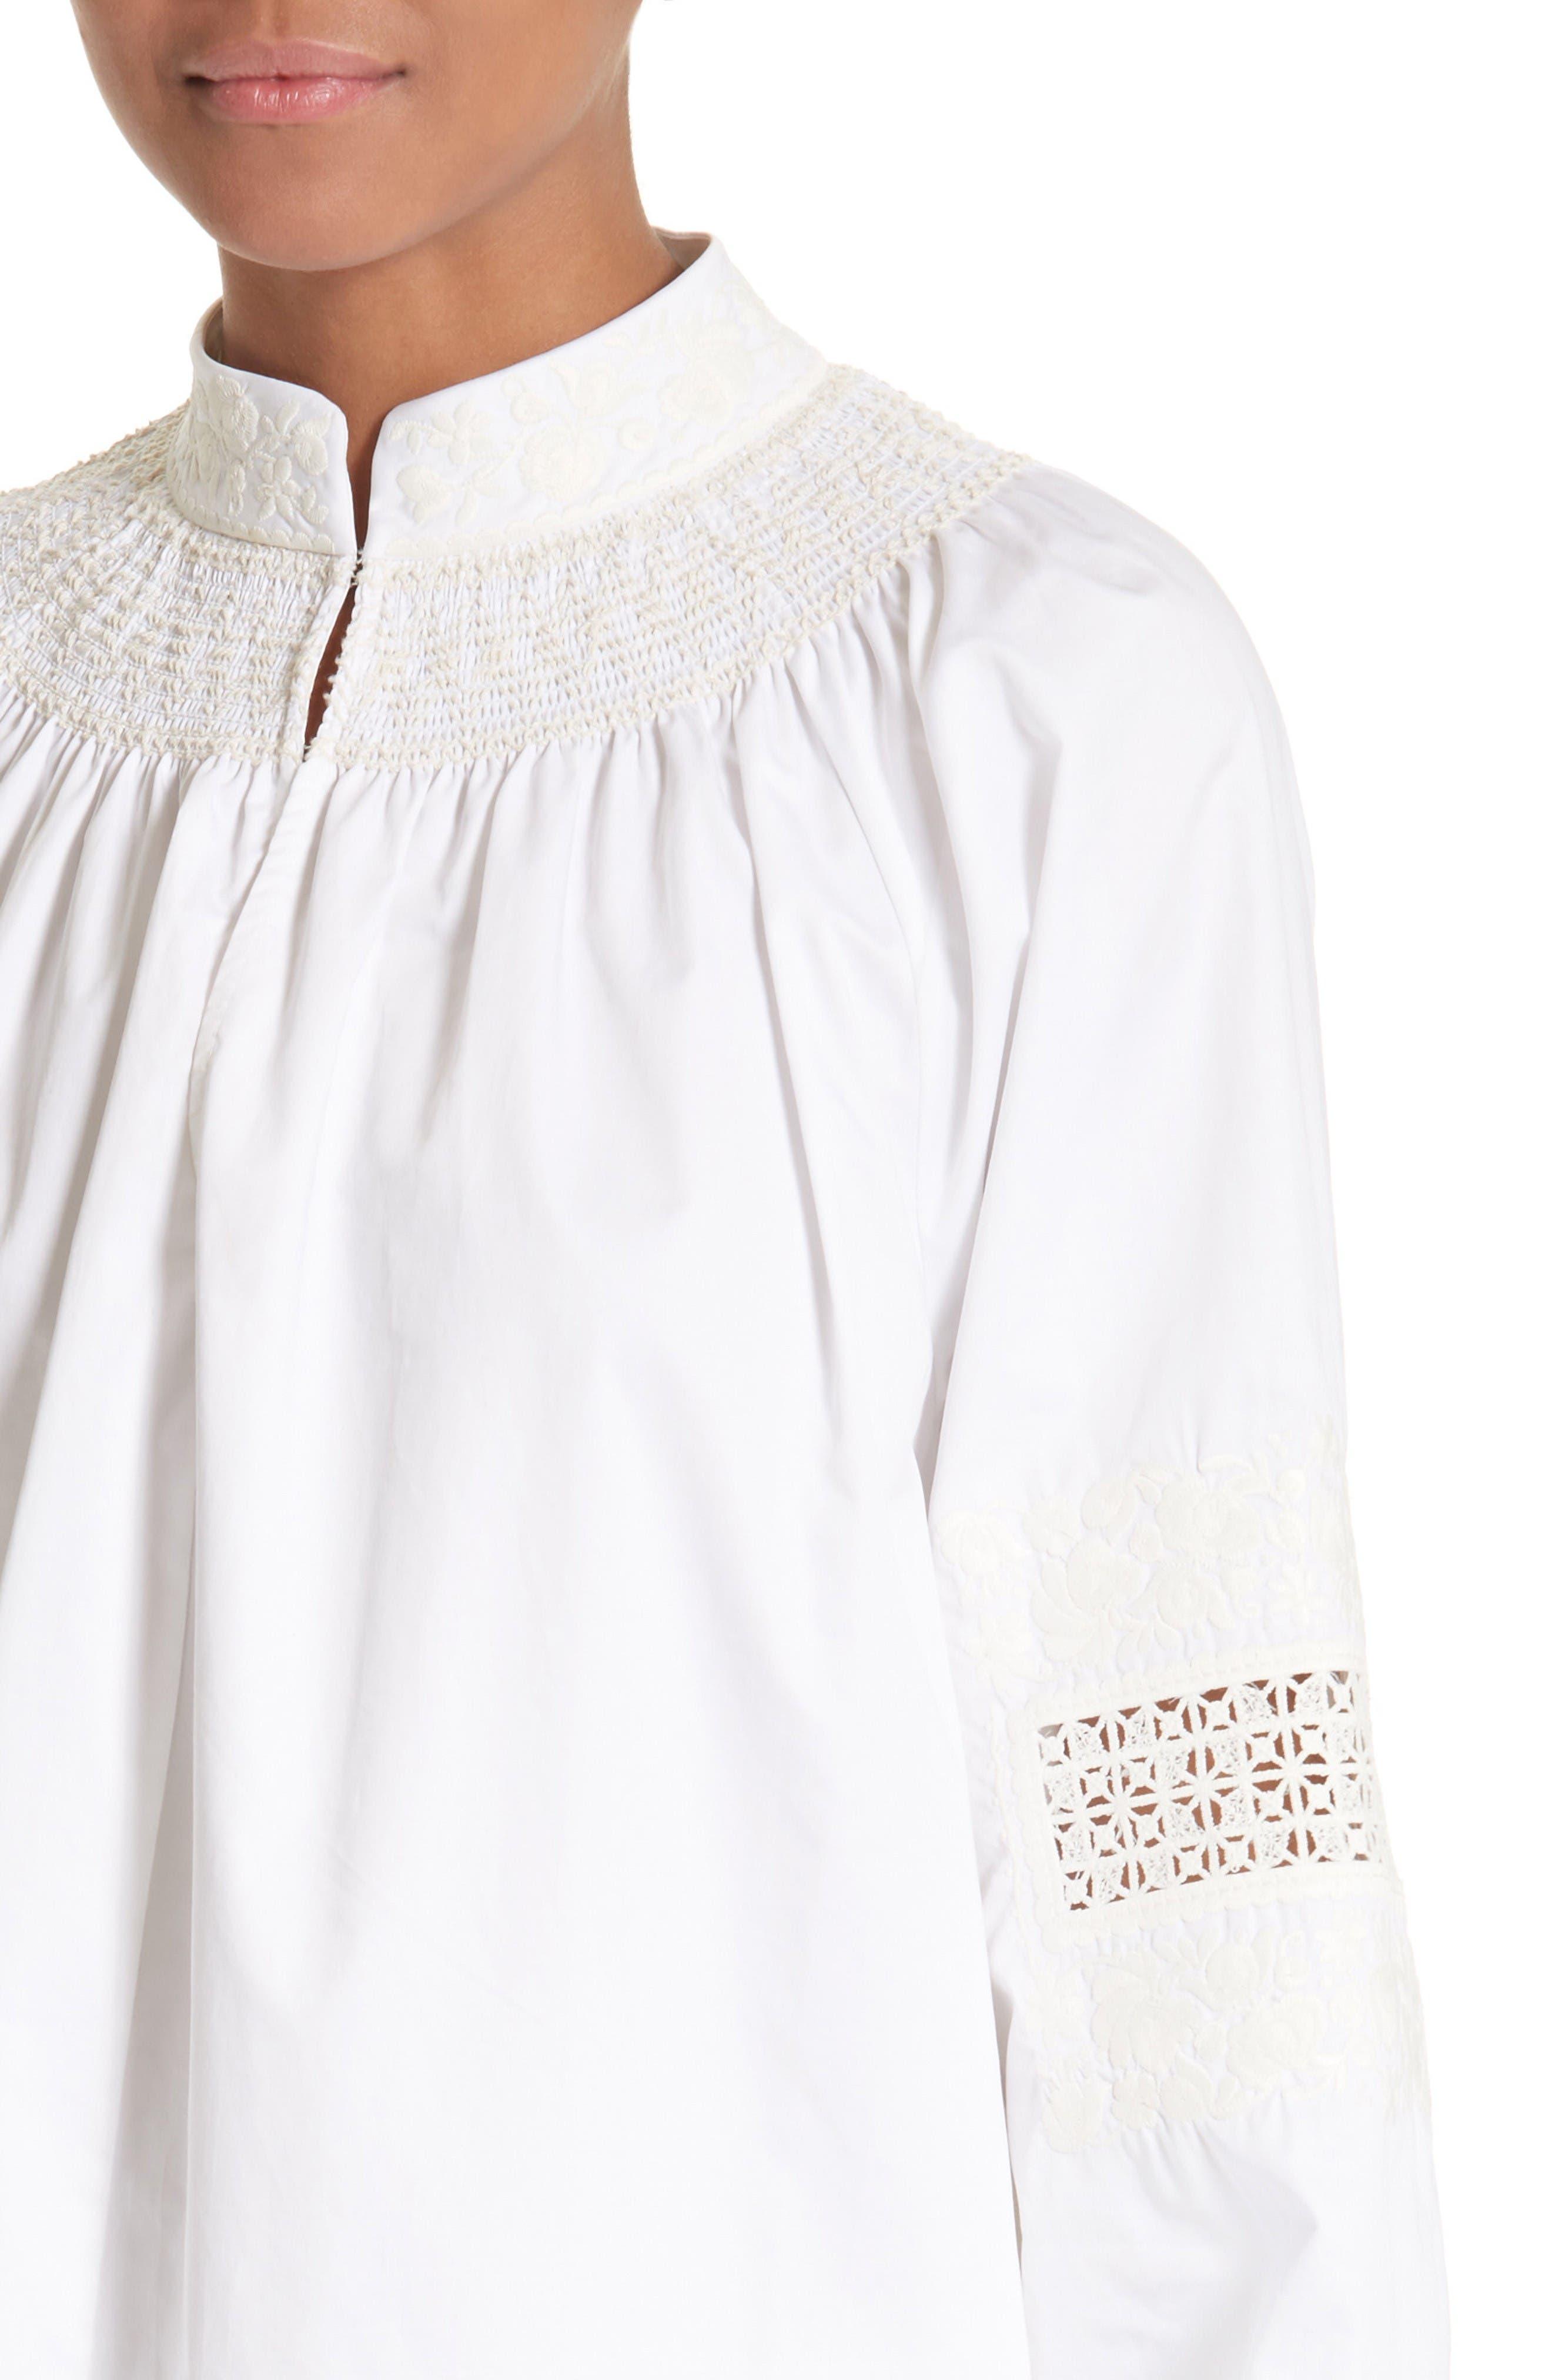 Smocked Tunic Dress,                             Alternate thumbnail 4, color,                             White/ Ivory Multi